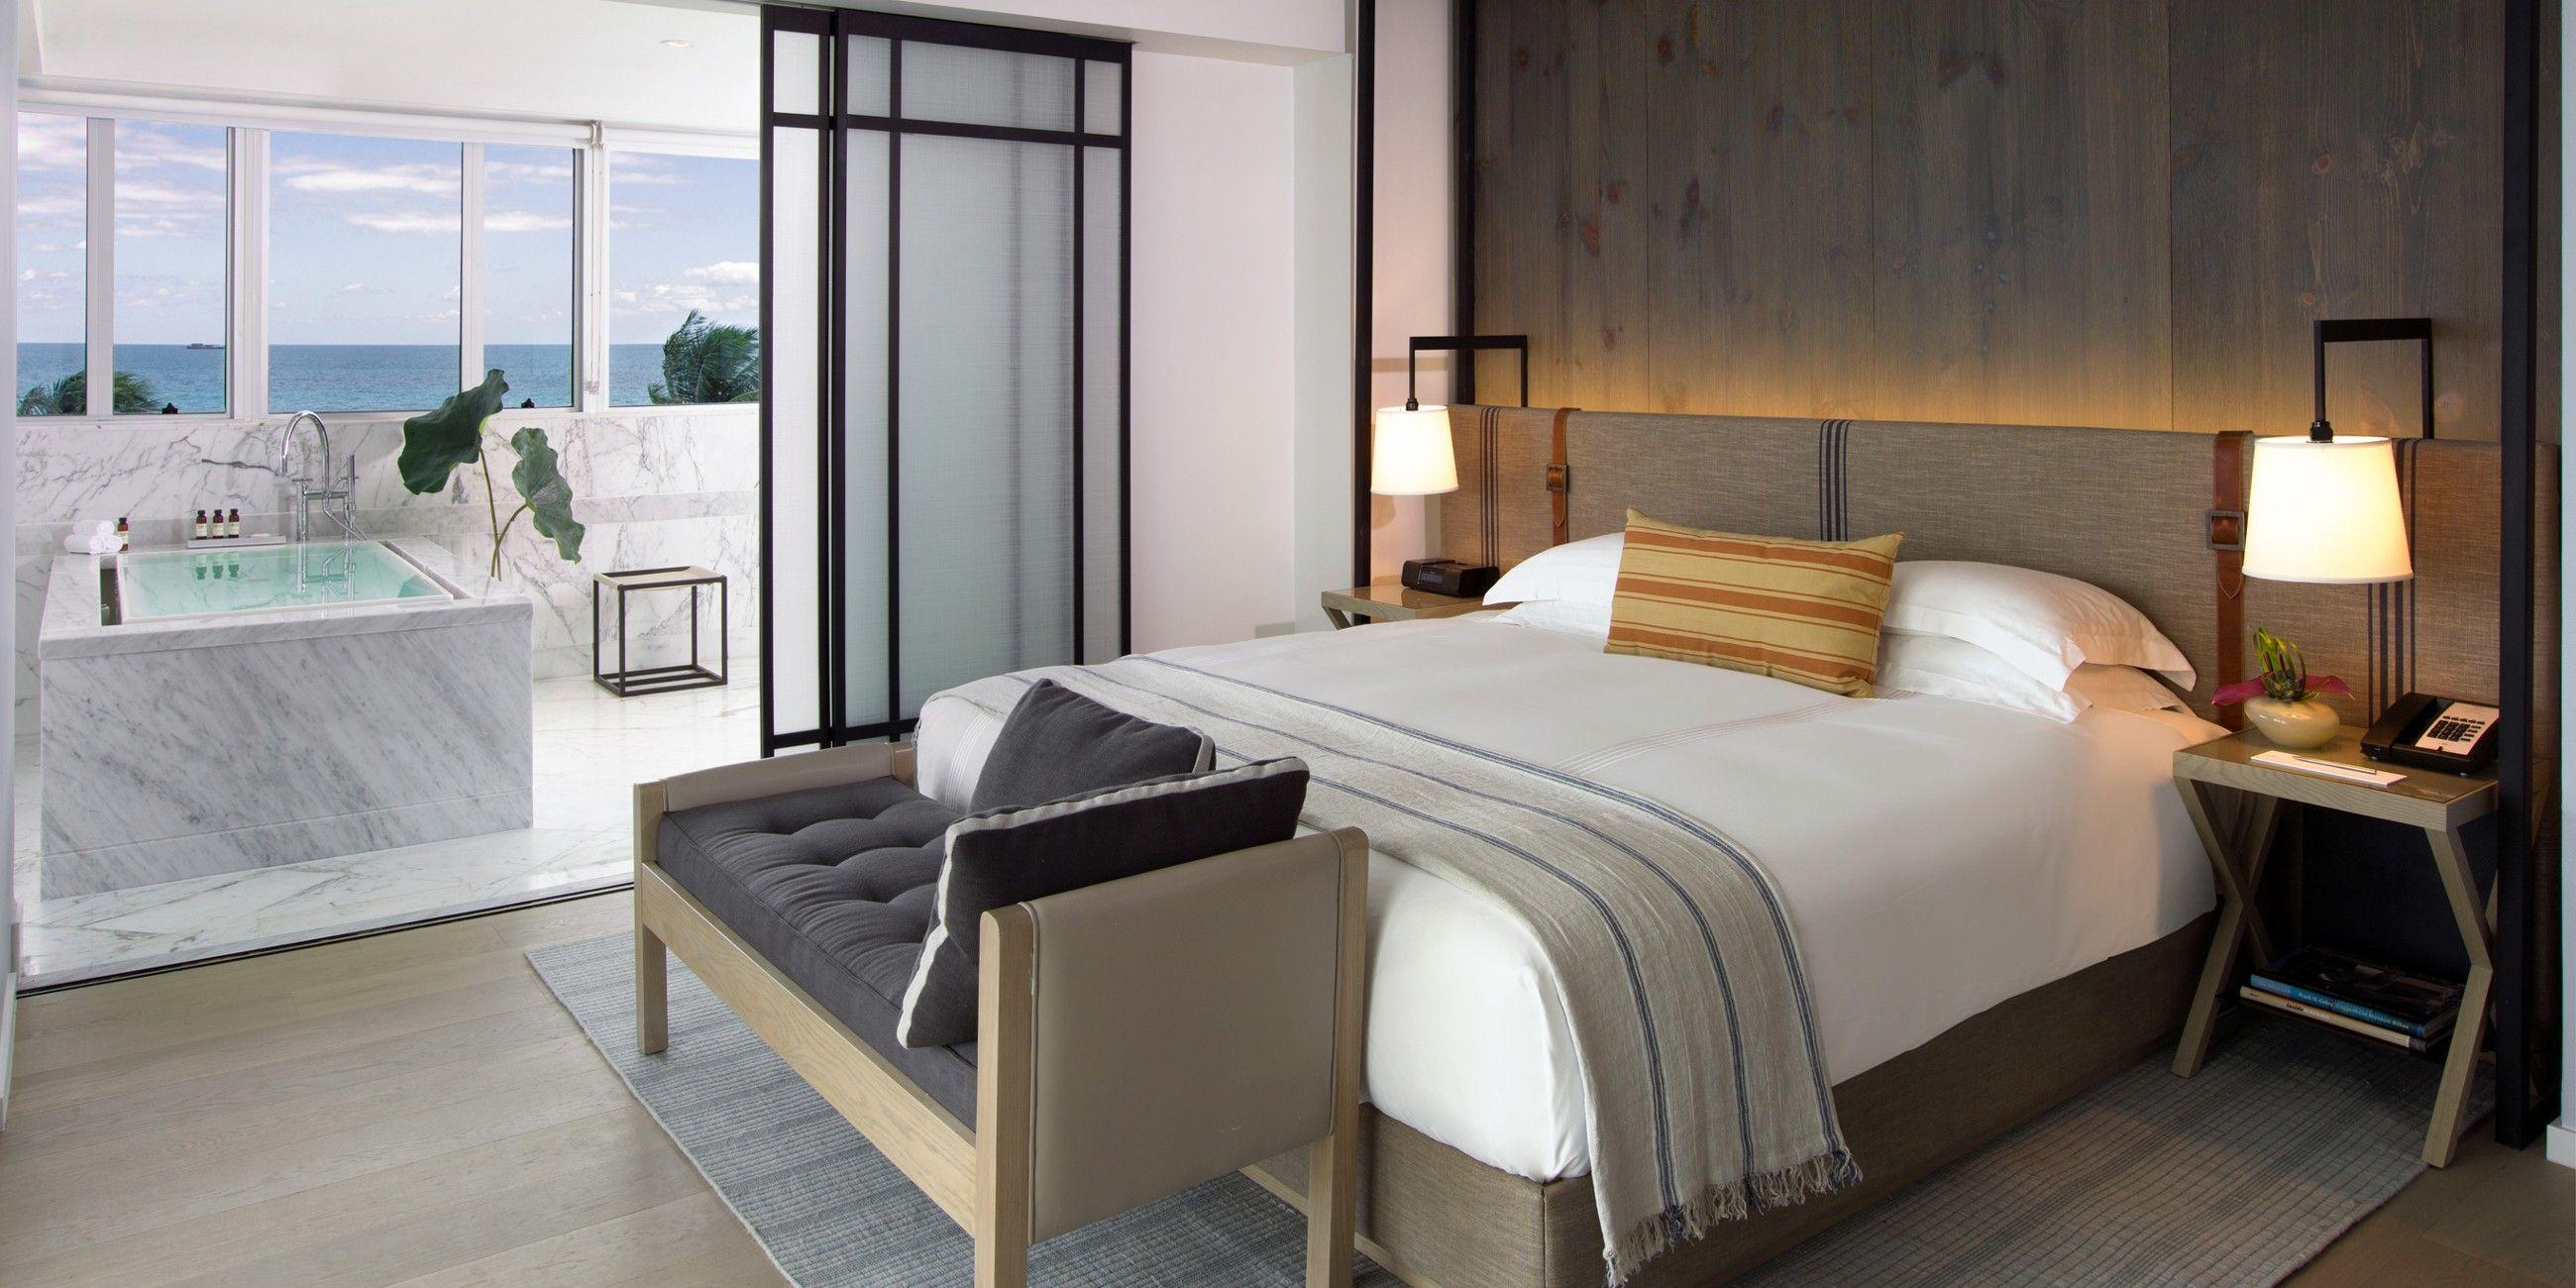 Master bedroom jacuzzi designs  Cool Bed  Jacuzzi Boutique Style  Stylish Homes  Casas con Estilo